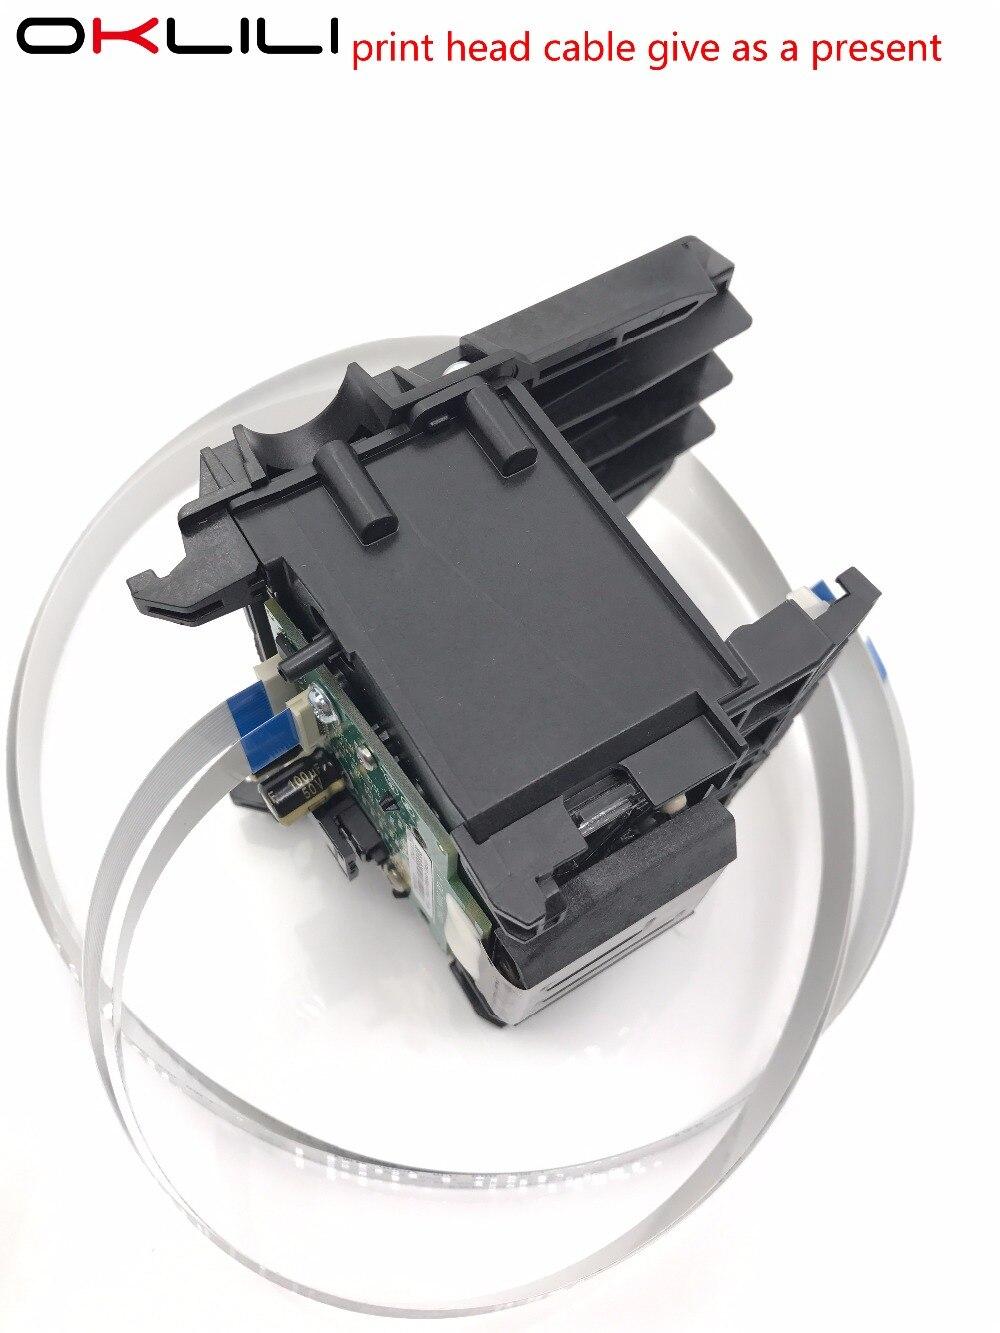 Image 5 - Печатающая головка для принтера HP 6060e 932 6100e 933 6100 6600  6700 7110 7600 7610, 932XL 933XL, 7612,print head for hpprint  headprinter print head